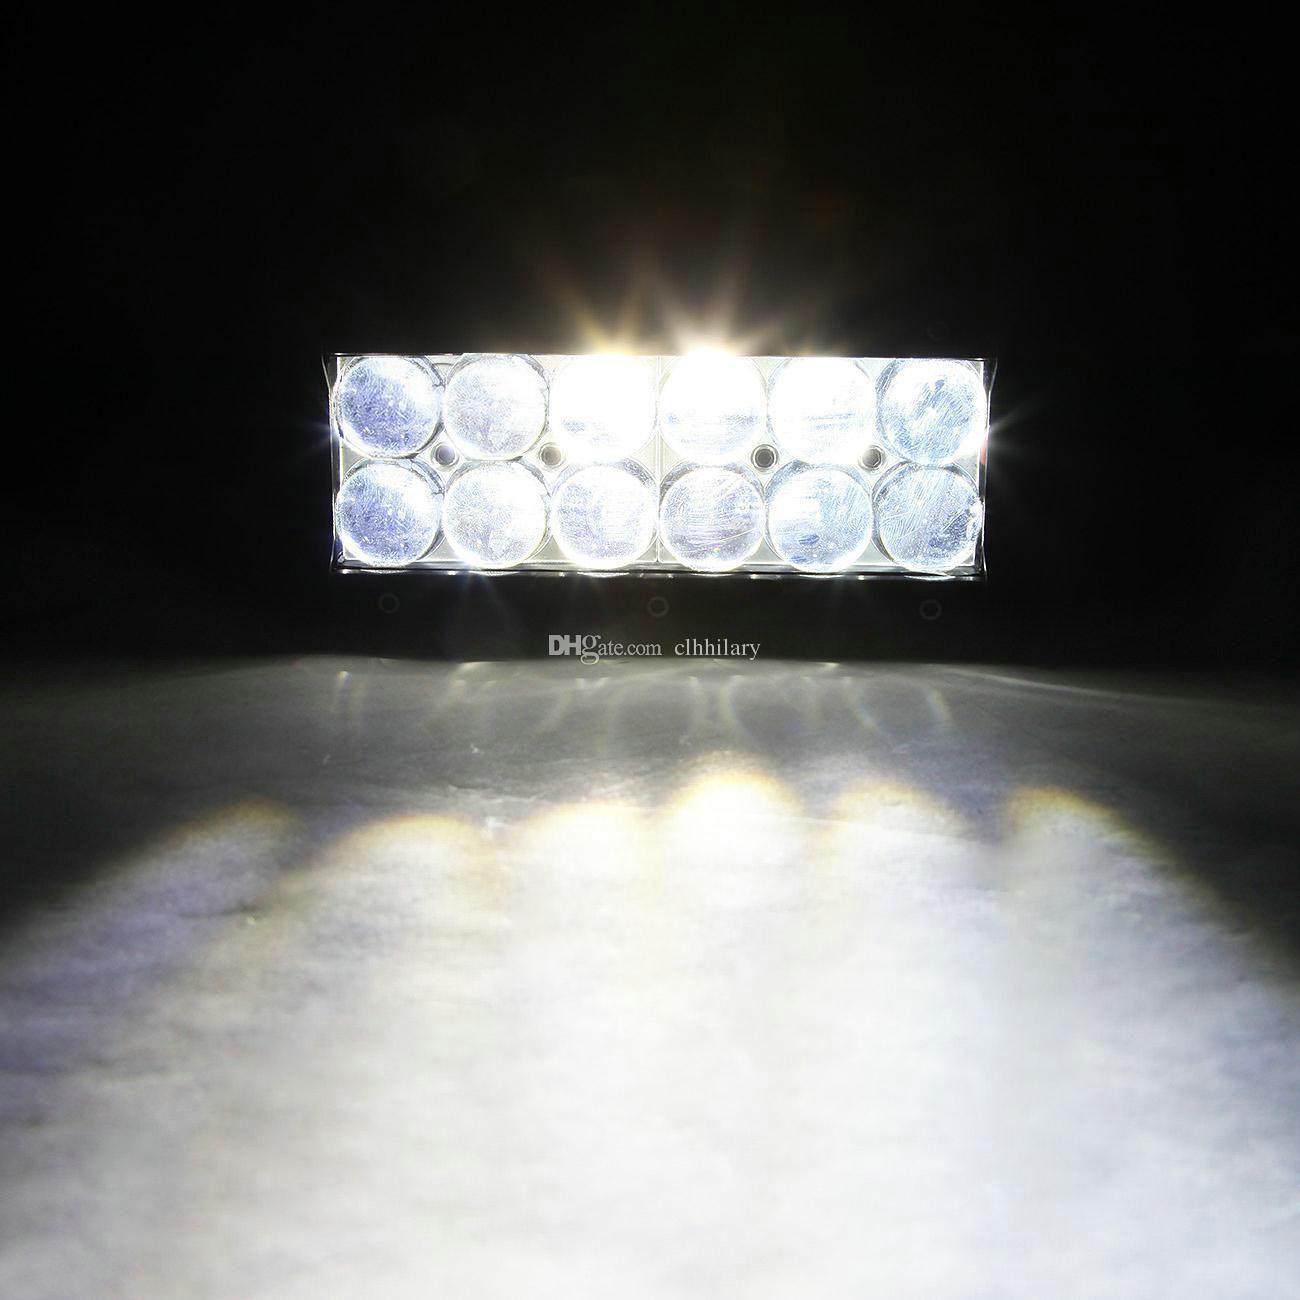 7 inch Osram 60W LED Work Light Bar 4D Spot Flood Beam Day Time Running Lamp Golf Offroad Driving Vehicle Boat 12V 24V